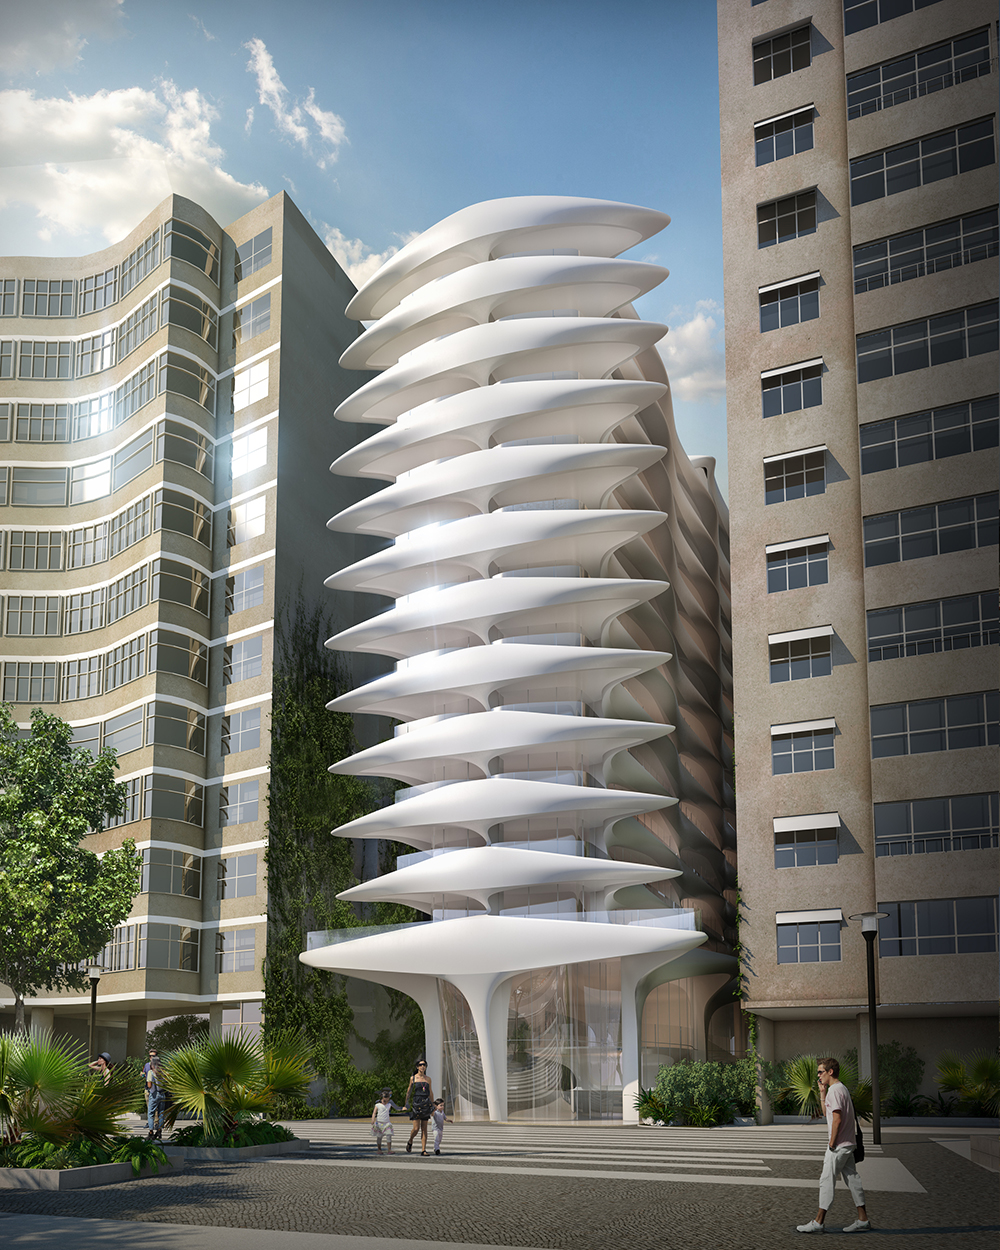 Morre a arquiteta Zaha Hadid